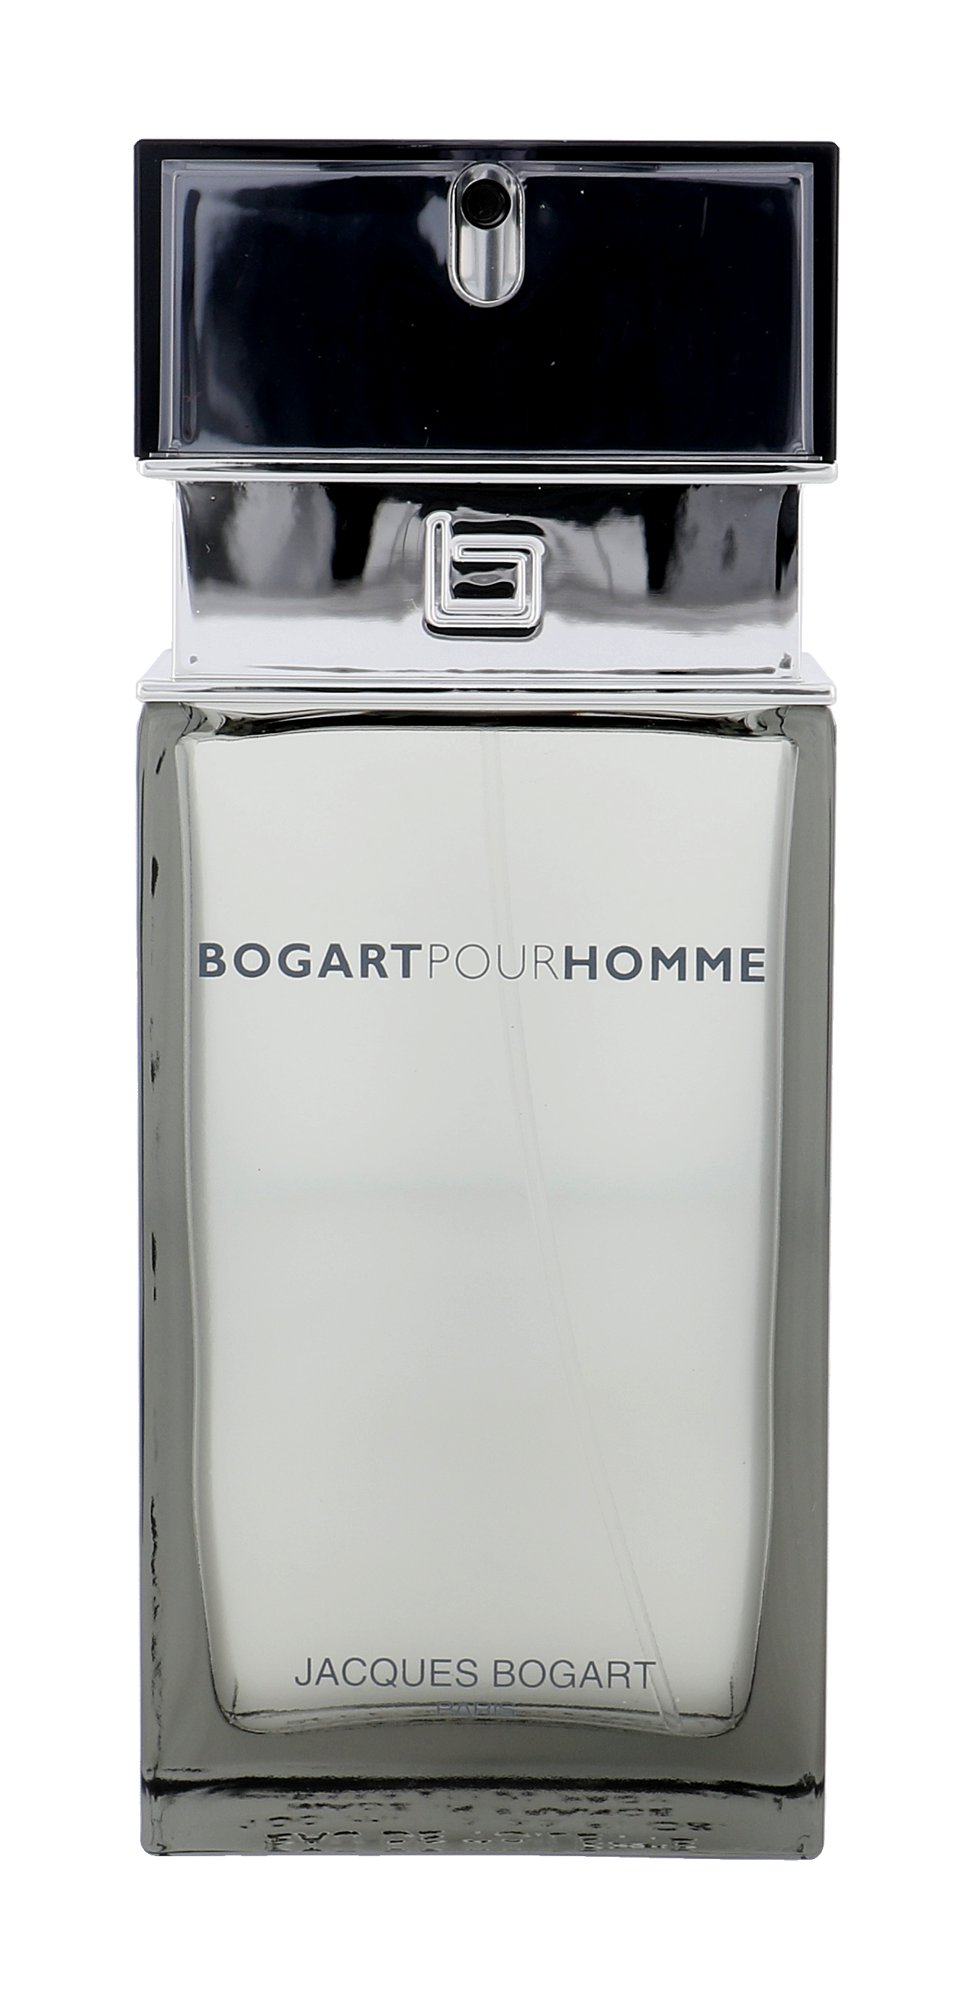 Jacques Bogart Bogart Pour Homme, Toaletní voda 100ml - Tester